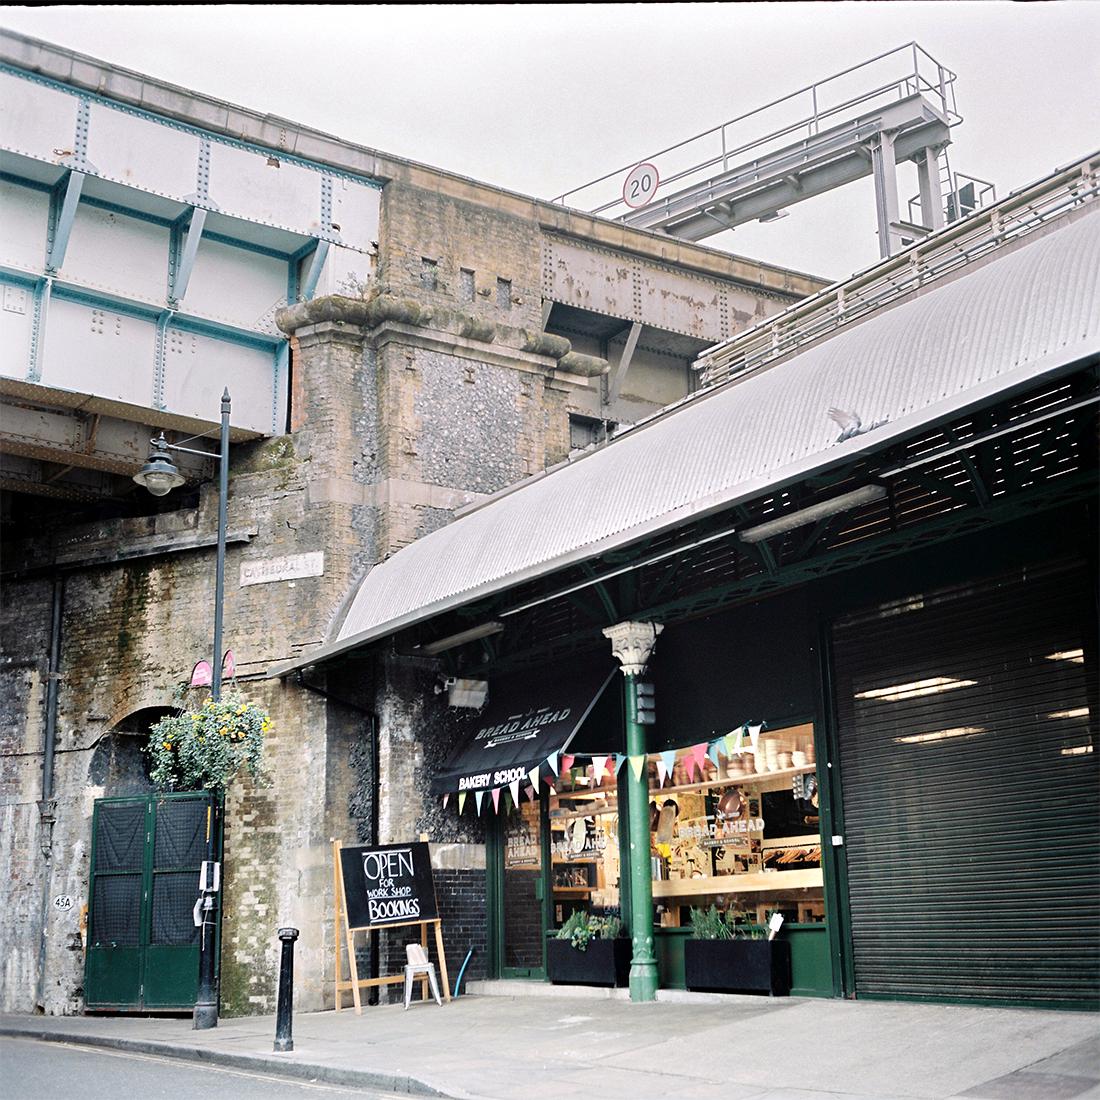 Corner Shop near Borough Market